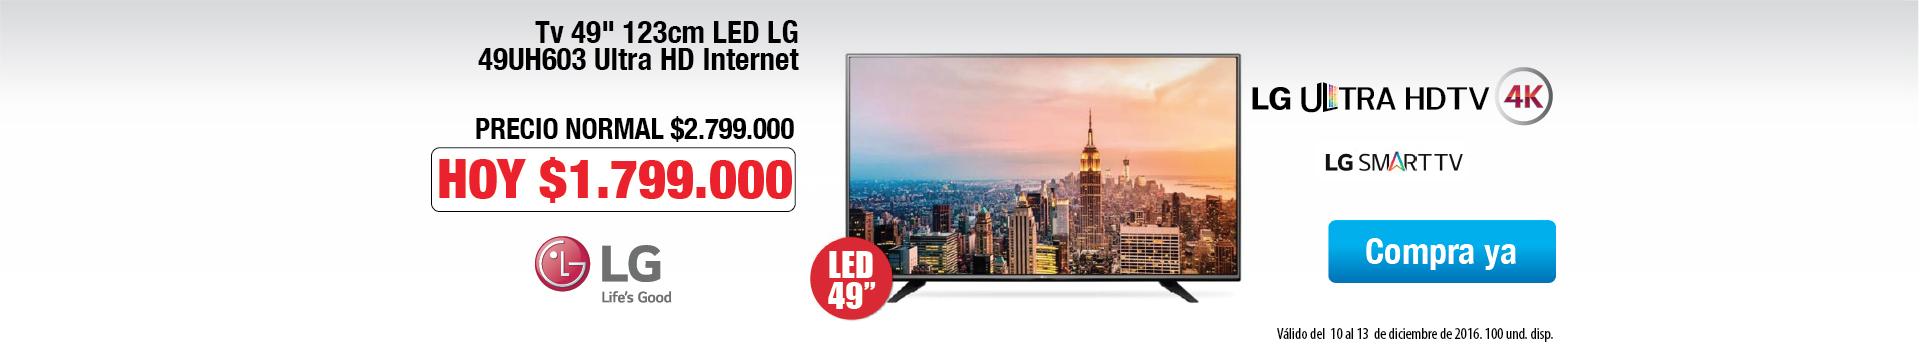 TV LG 49uh603